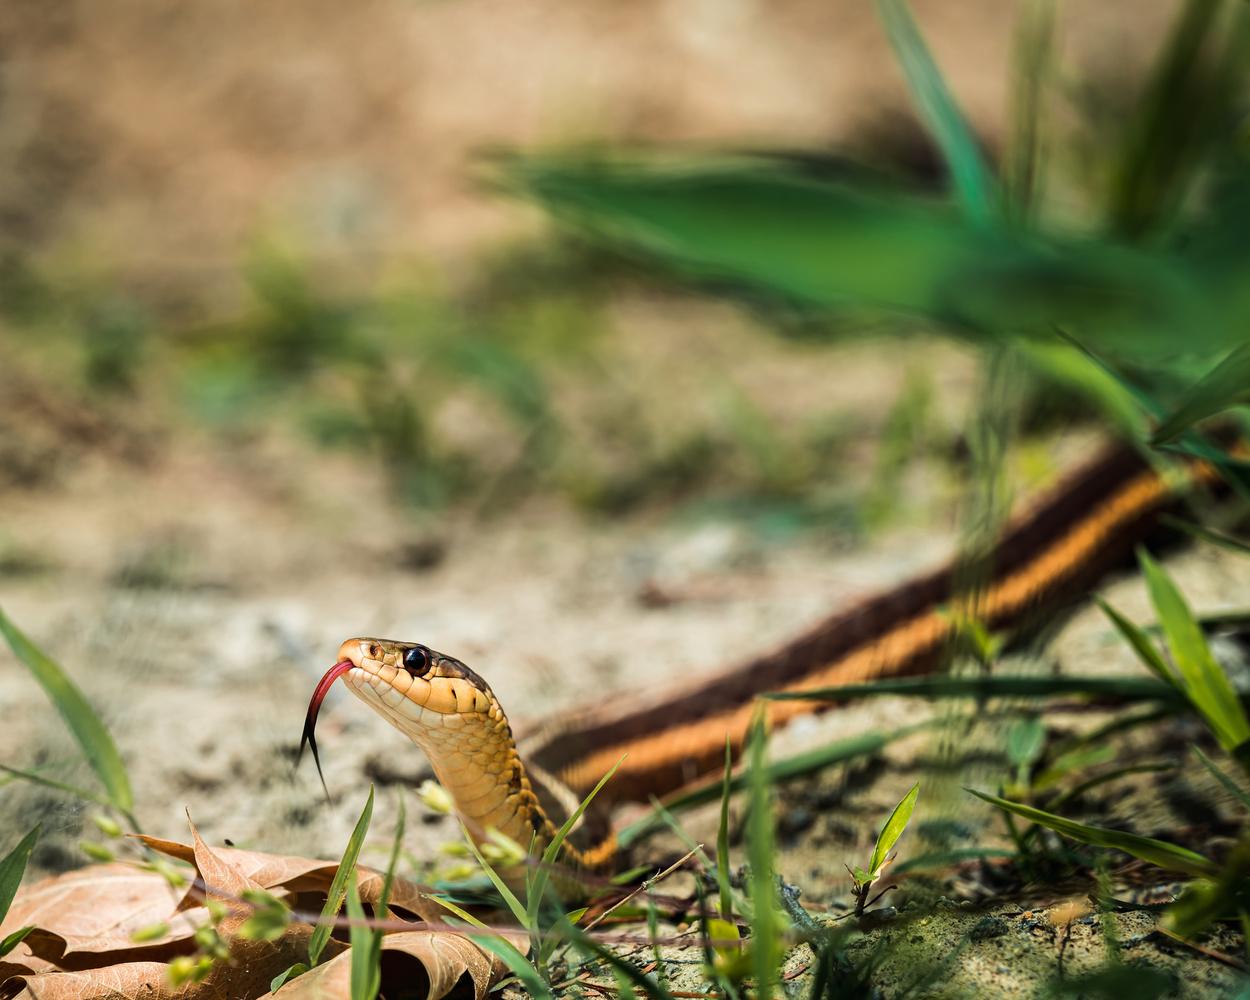 Snake by Skyler Ewing